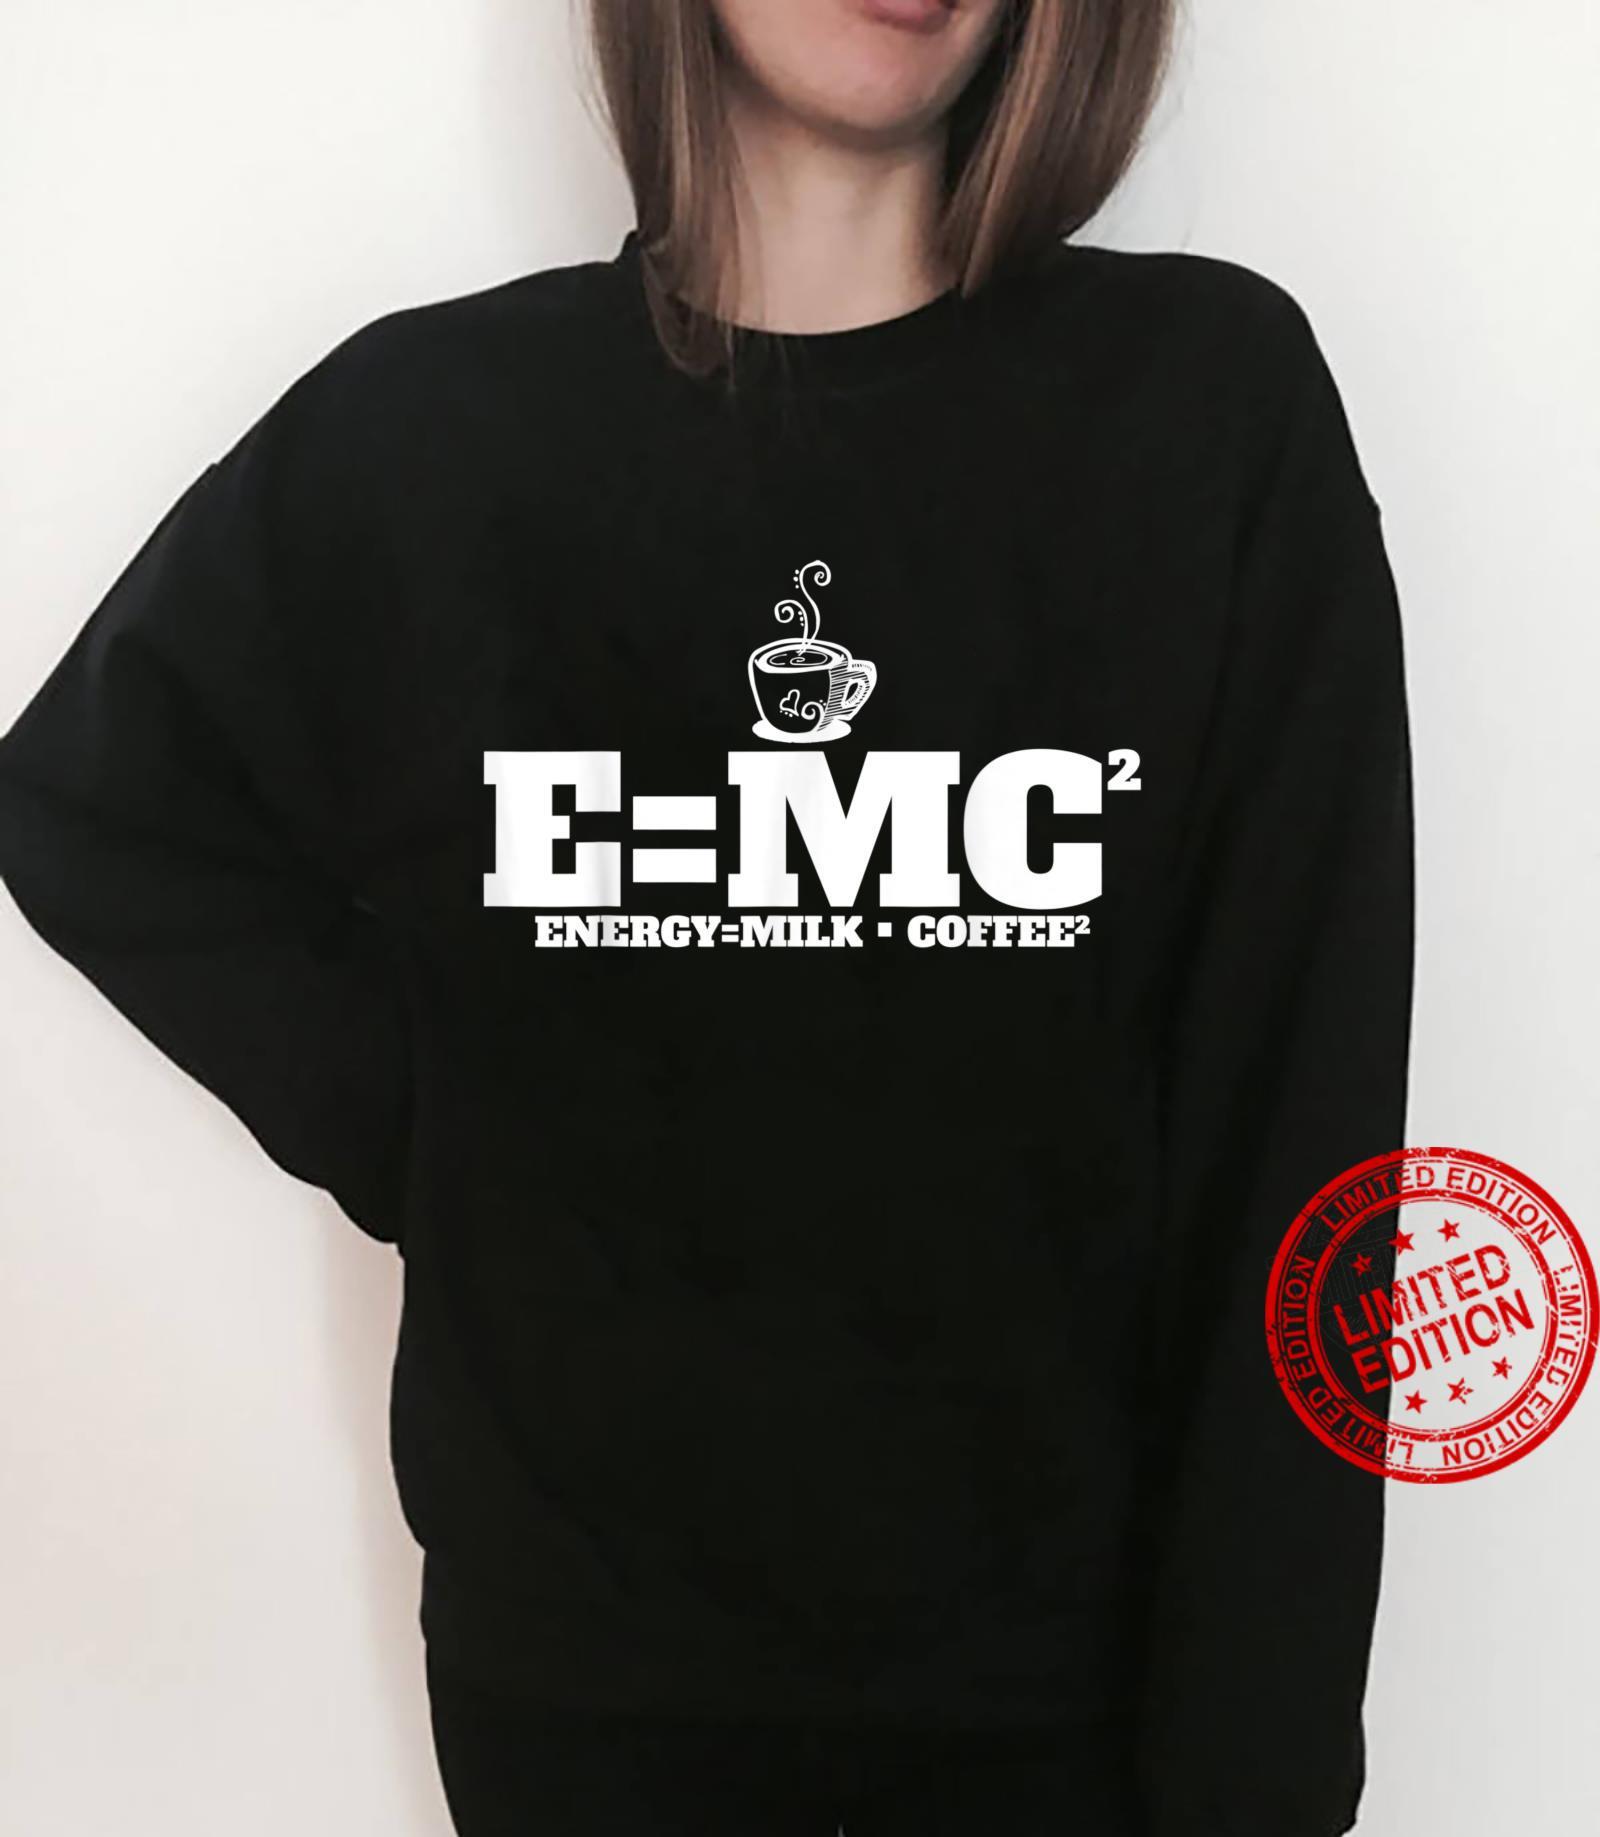 Kaffee Milchkaffee Kaffeetrinker Frühaufsteher Koffein Shirt sweater